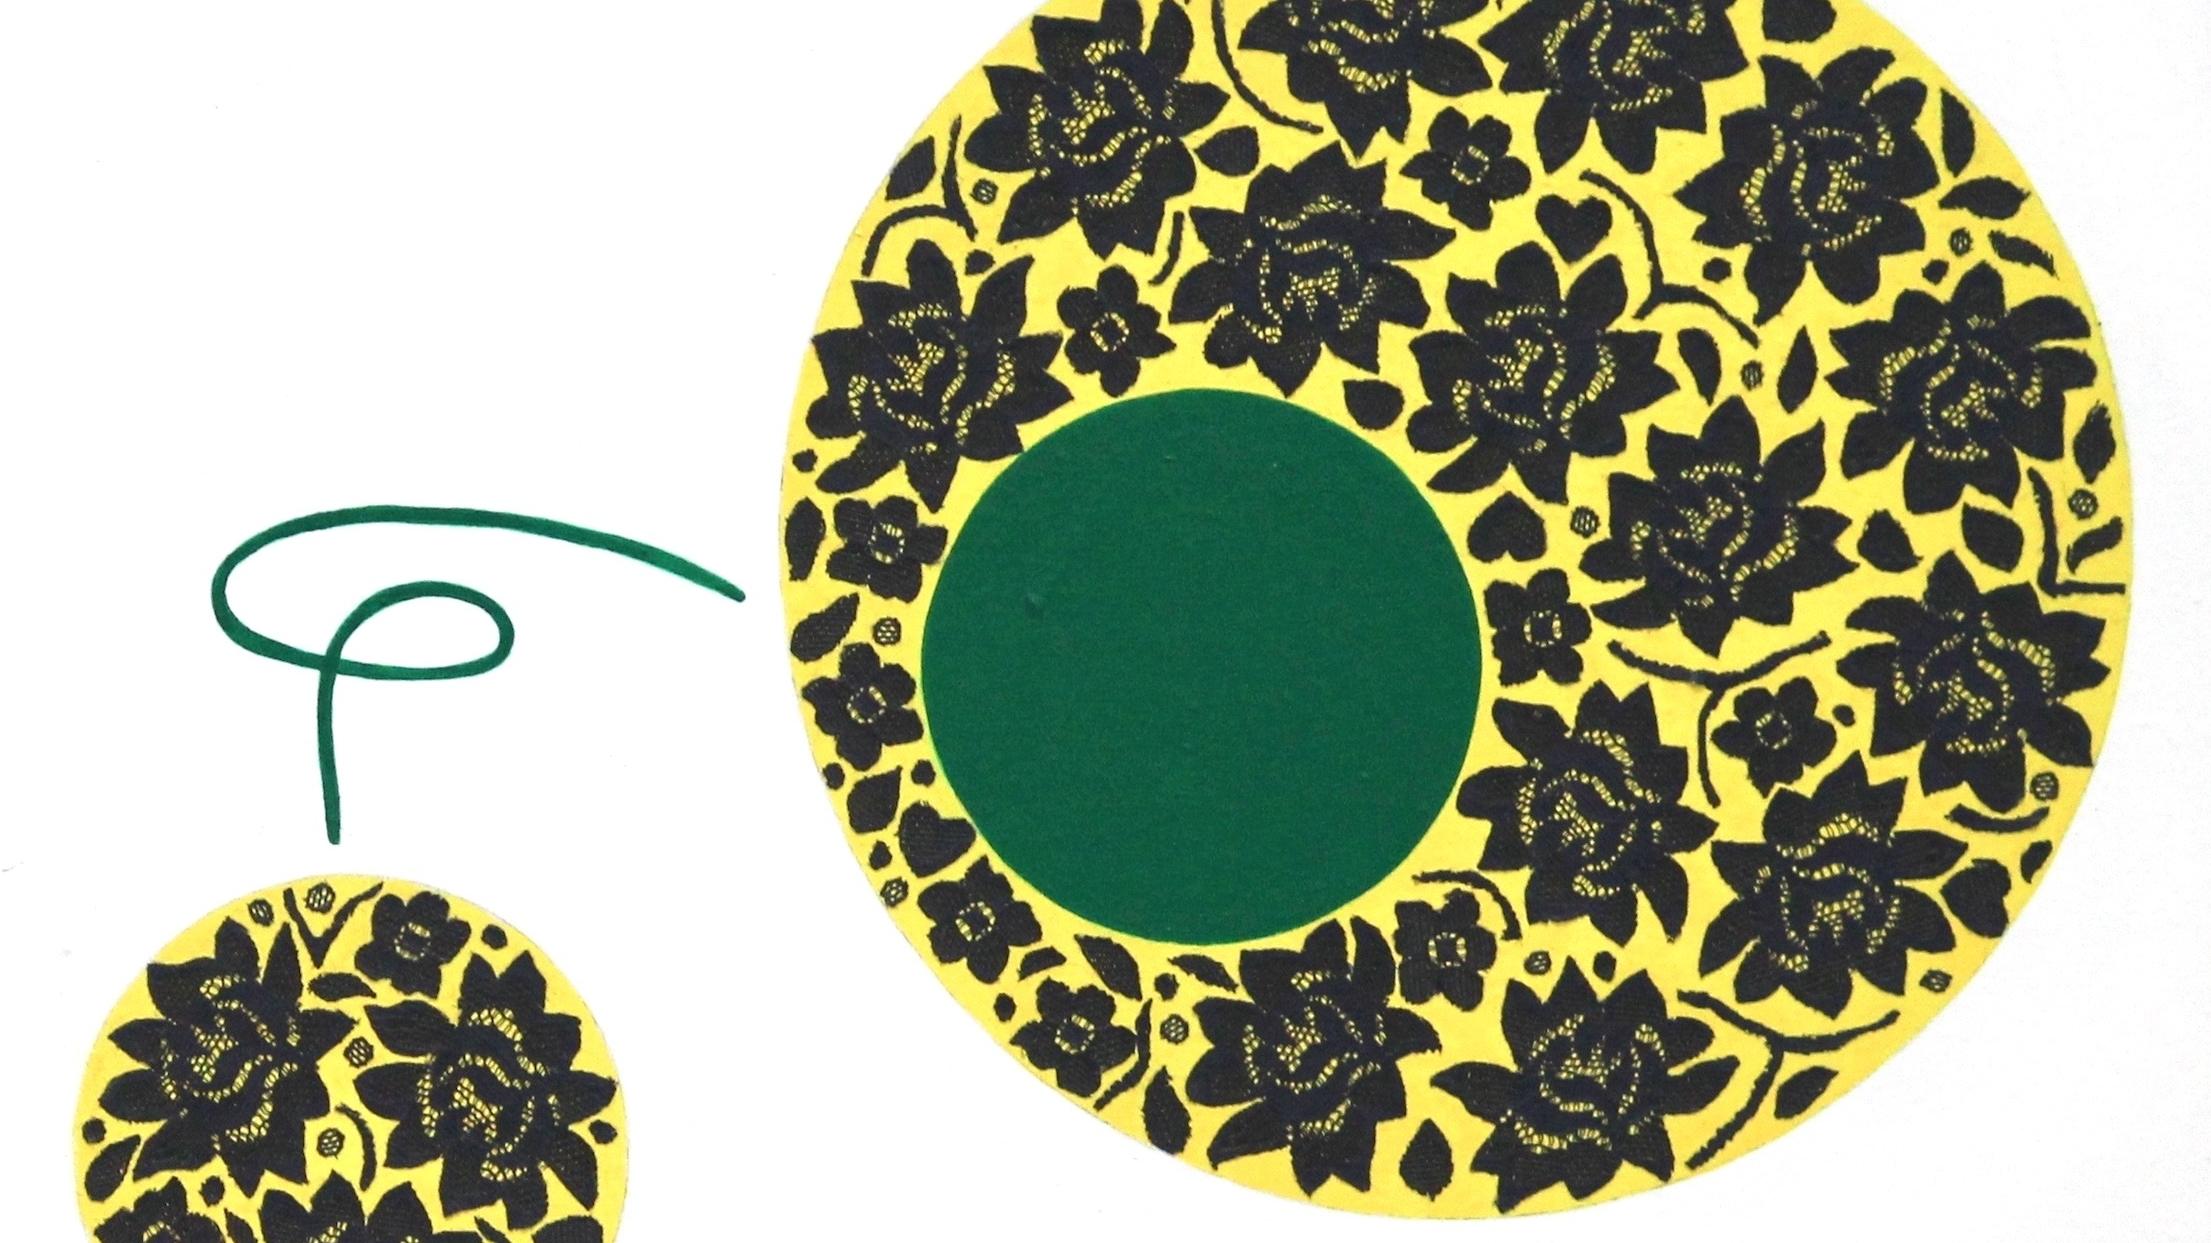 3-elizabeth-roetzel-abstract-conceptual-lace-acrylic-textile.jpg